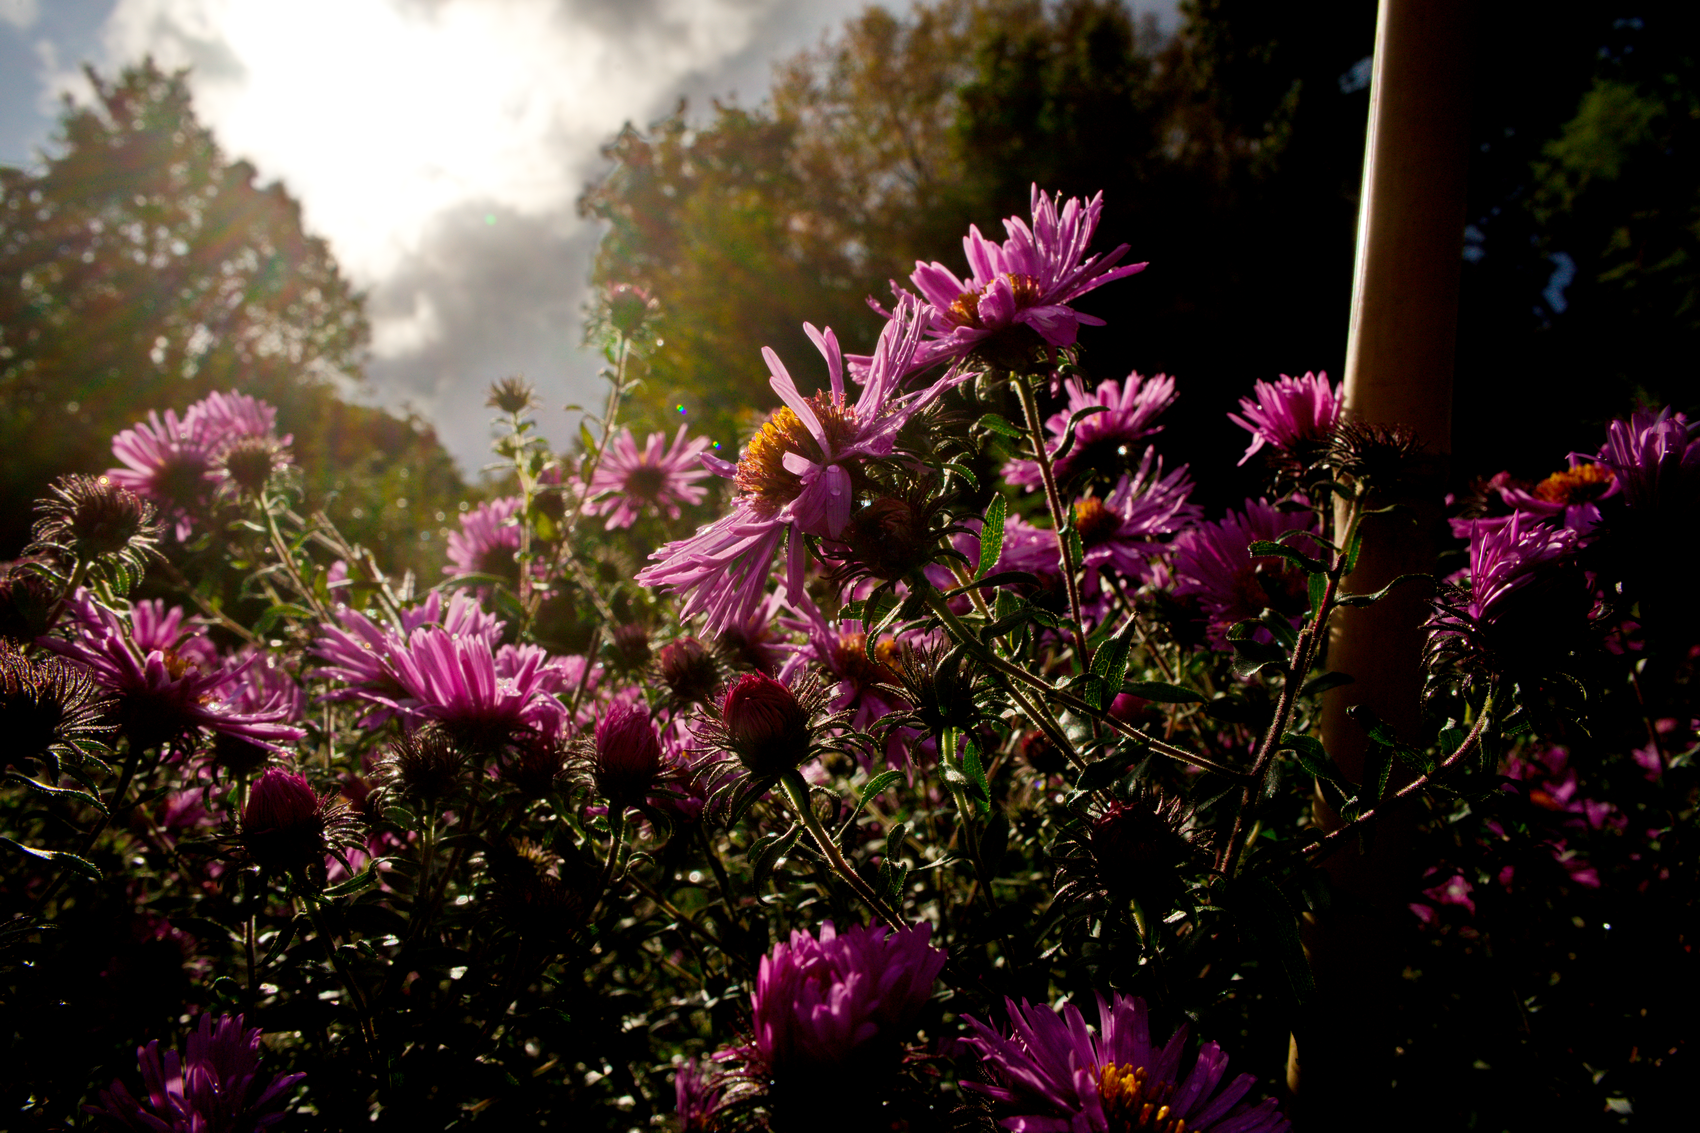 Herbstaster, photo: tma